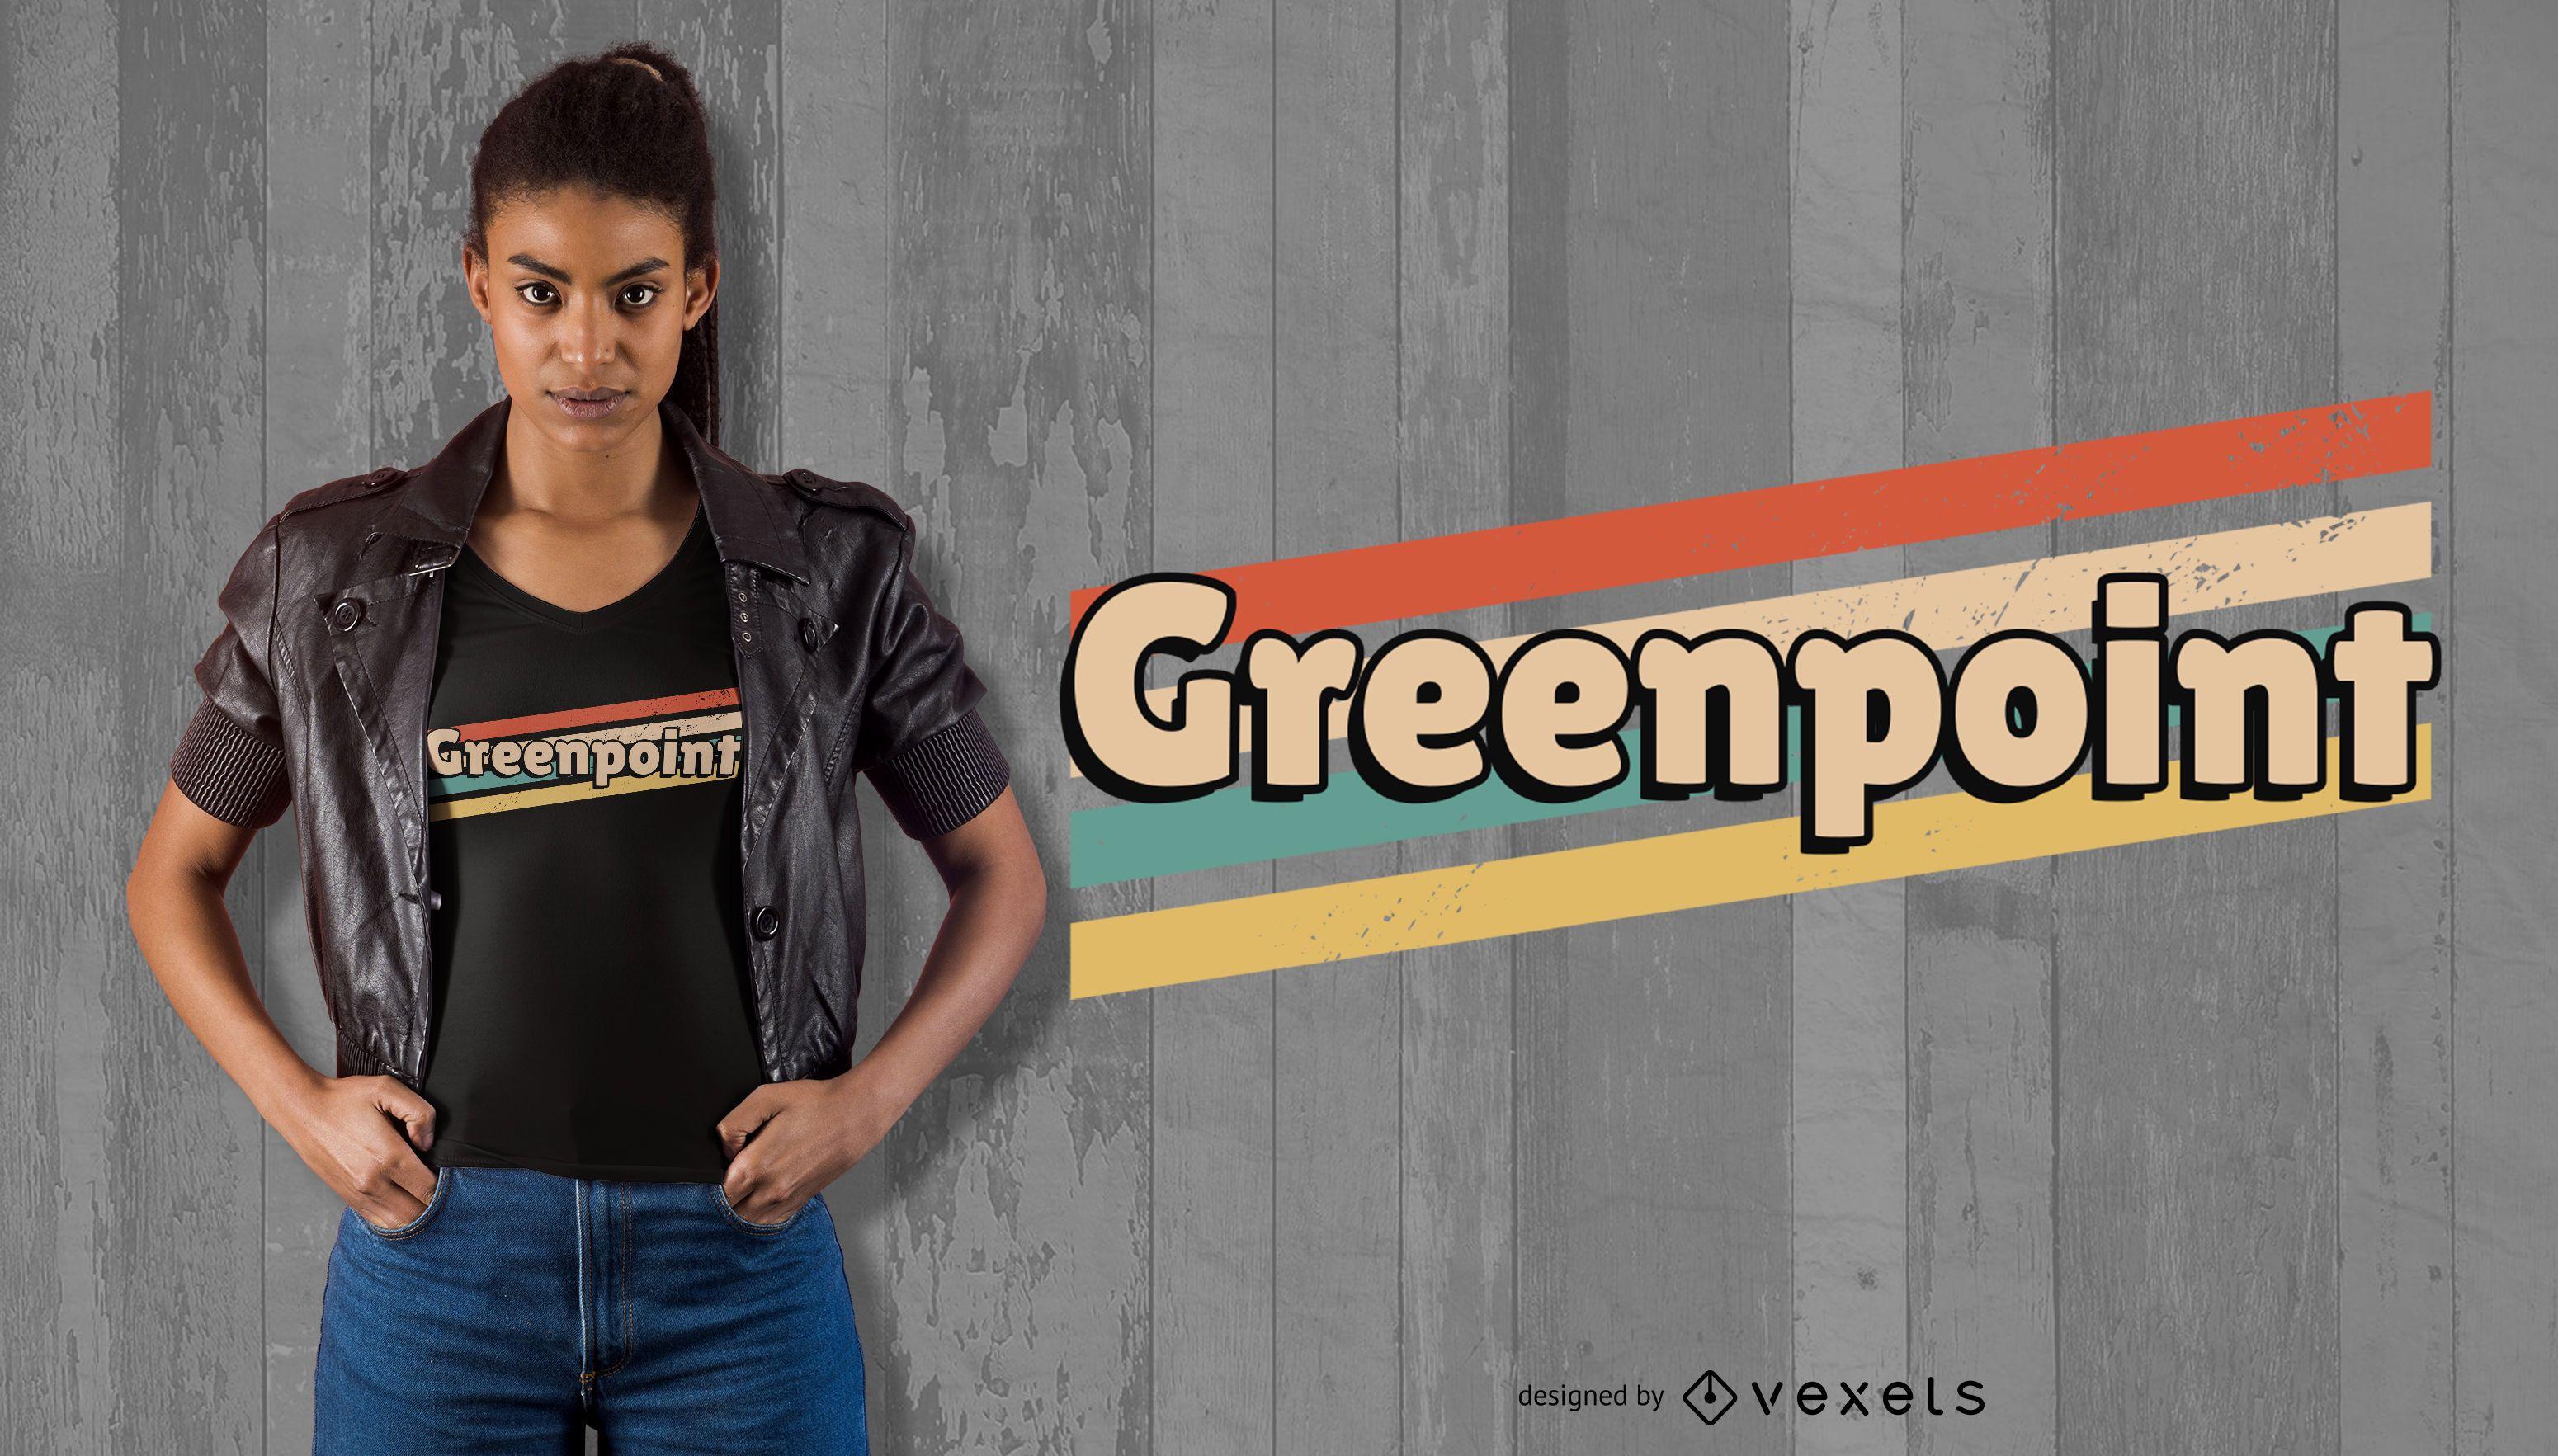 Greenpoint T-Shirt Design